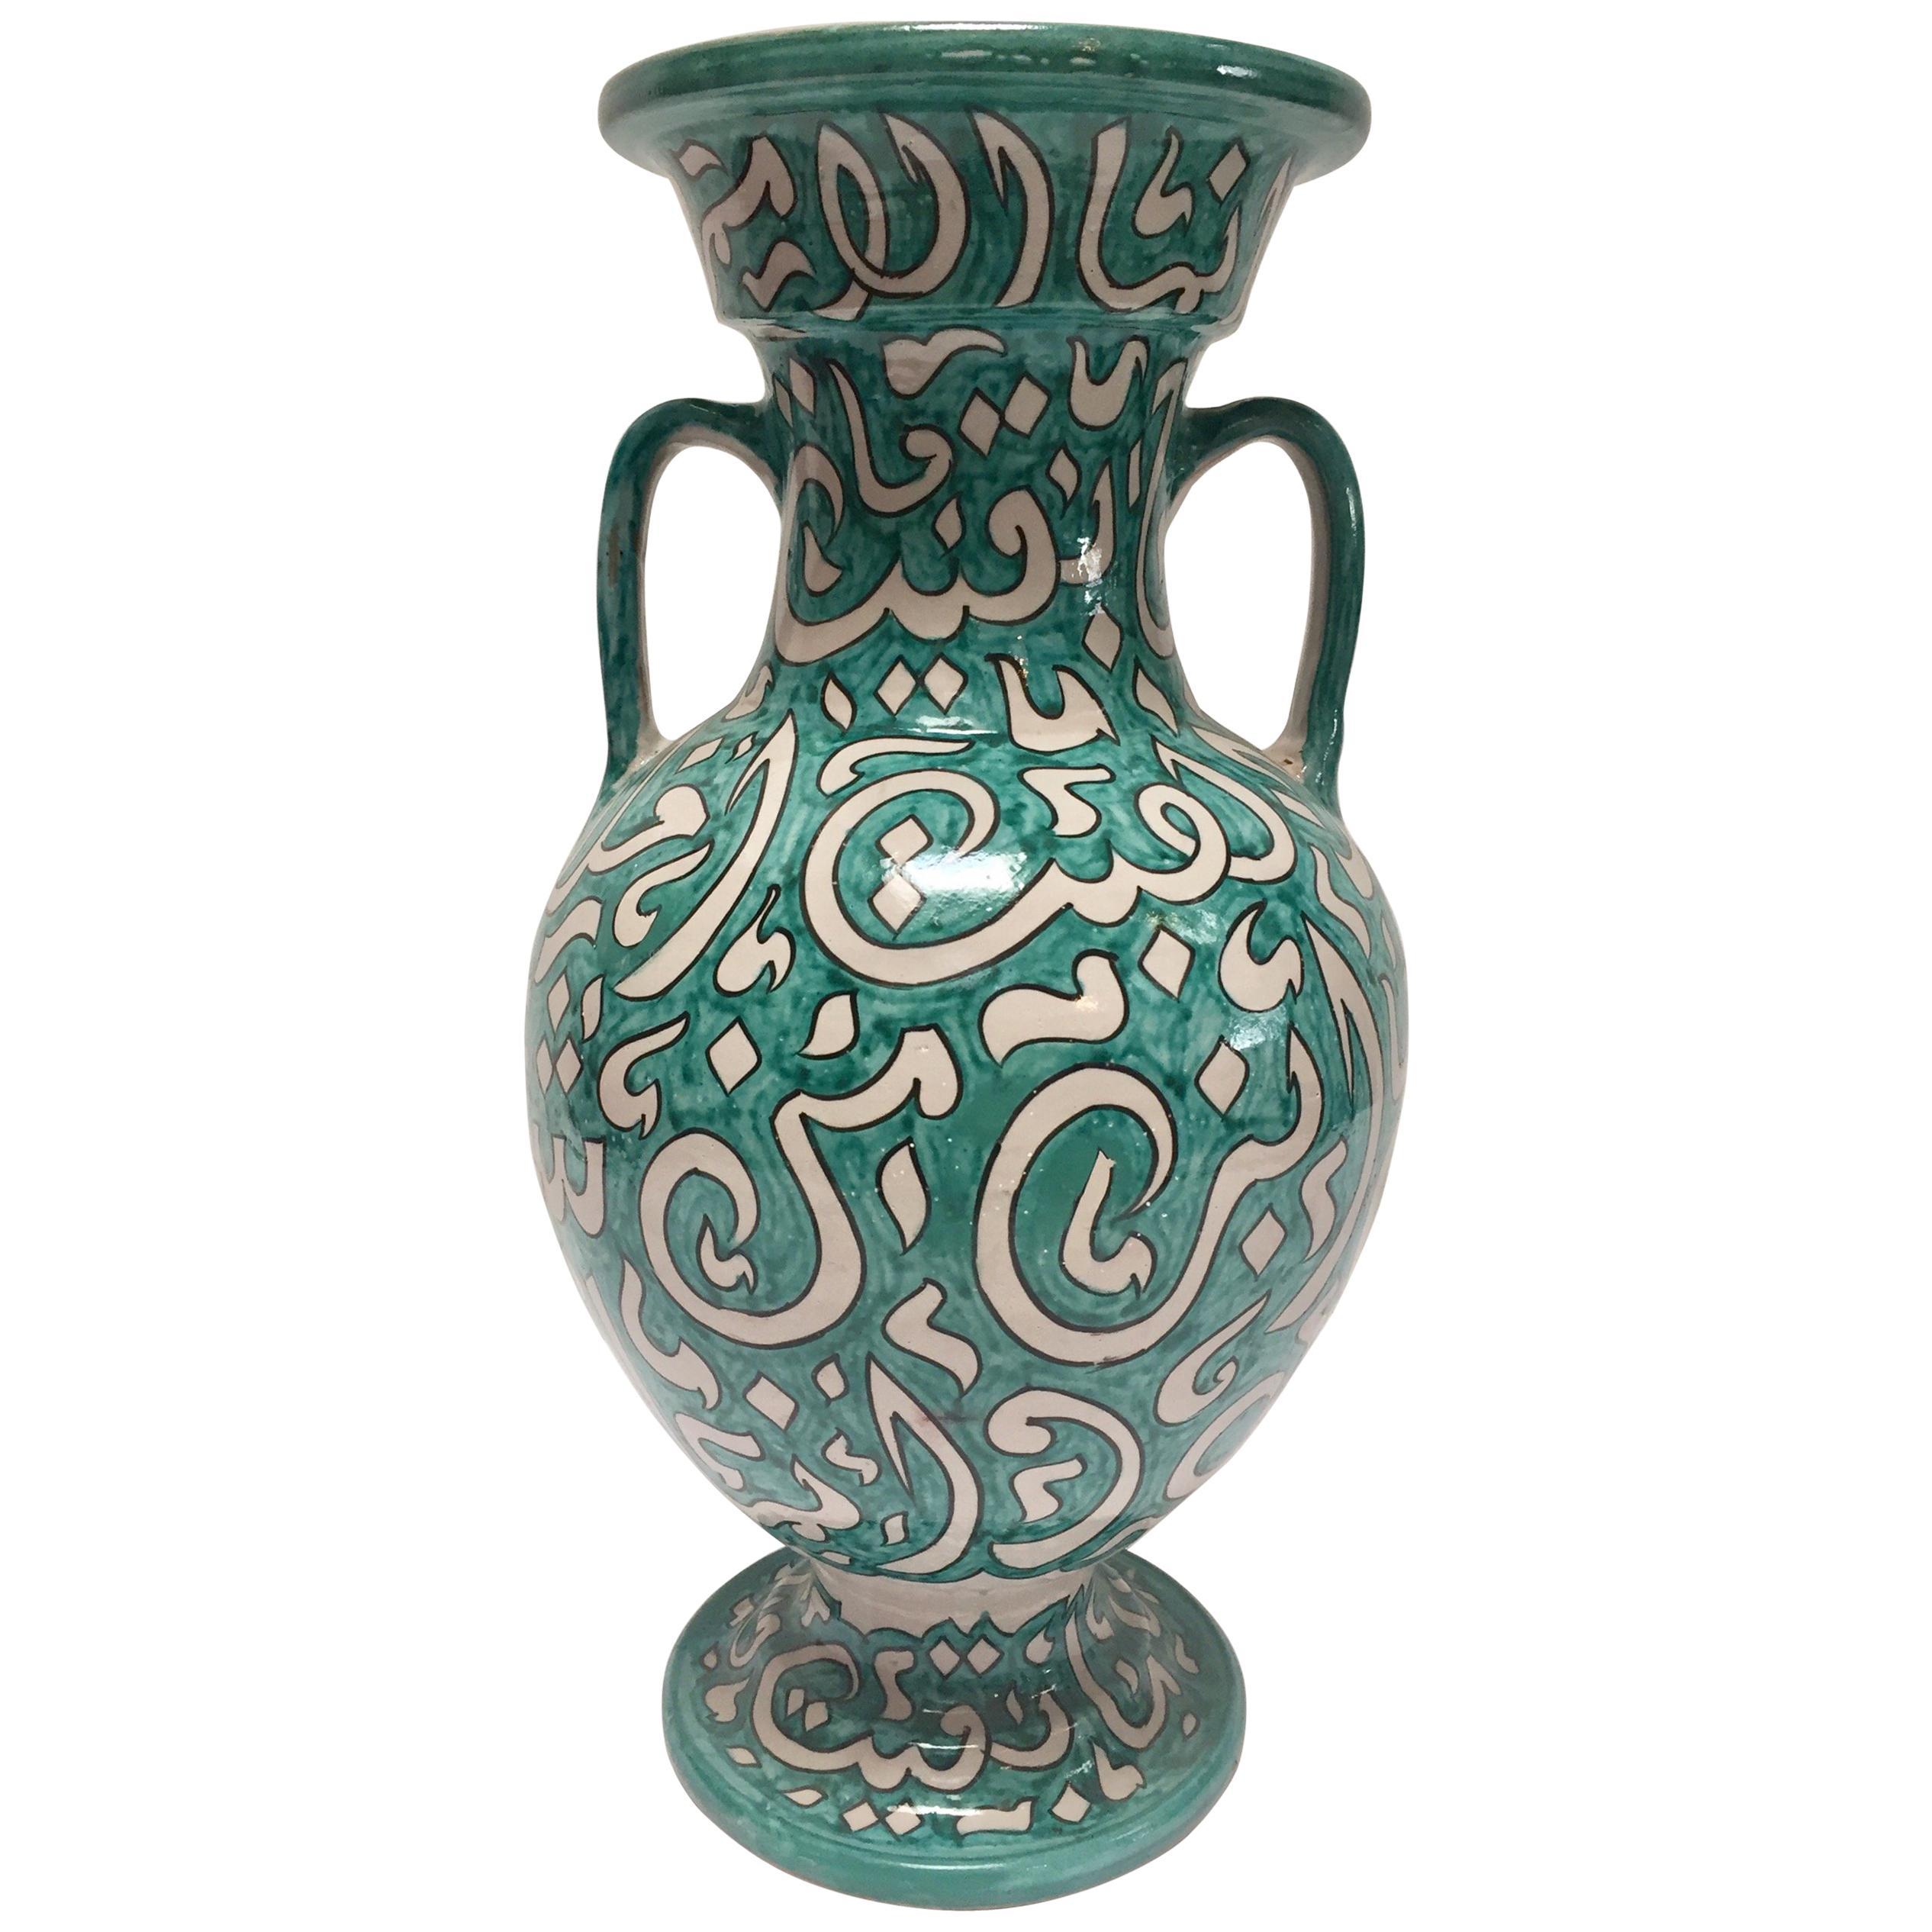 Large Moroccan Glazed Ceramic Vase with Arabic Calligraphy Turquoise Writing Fez